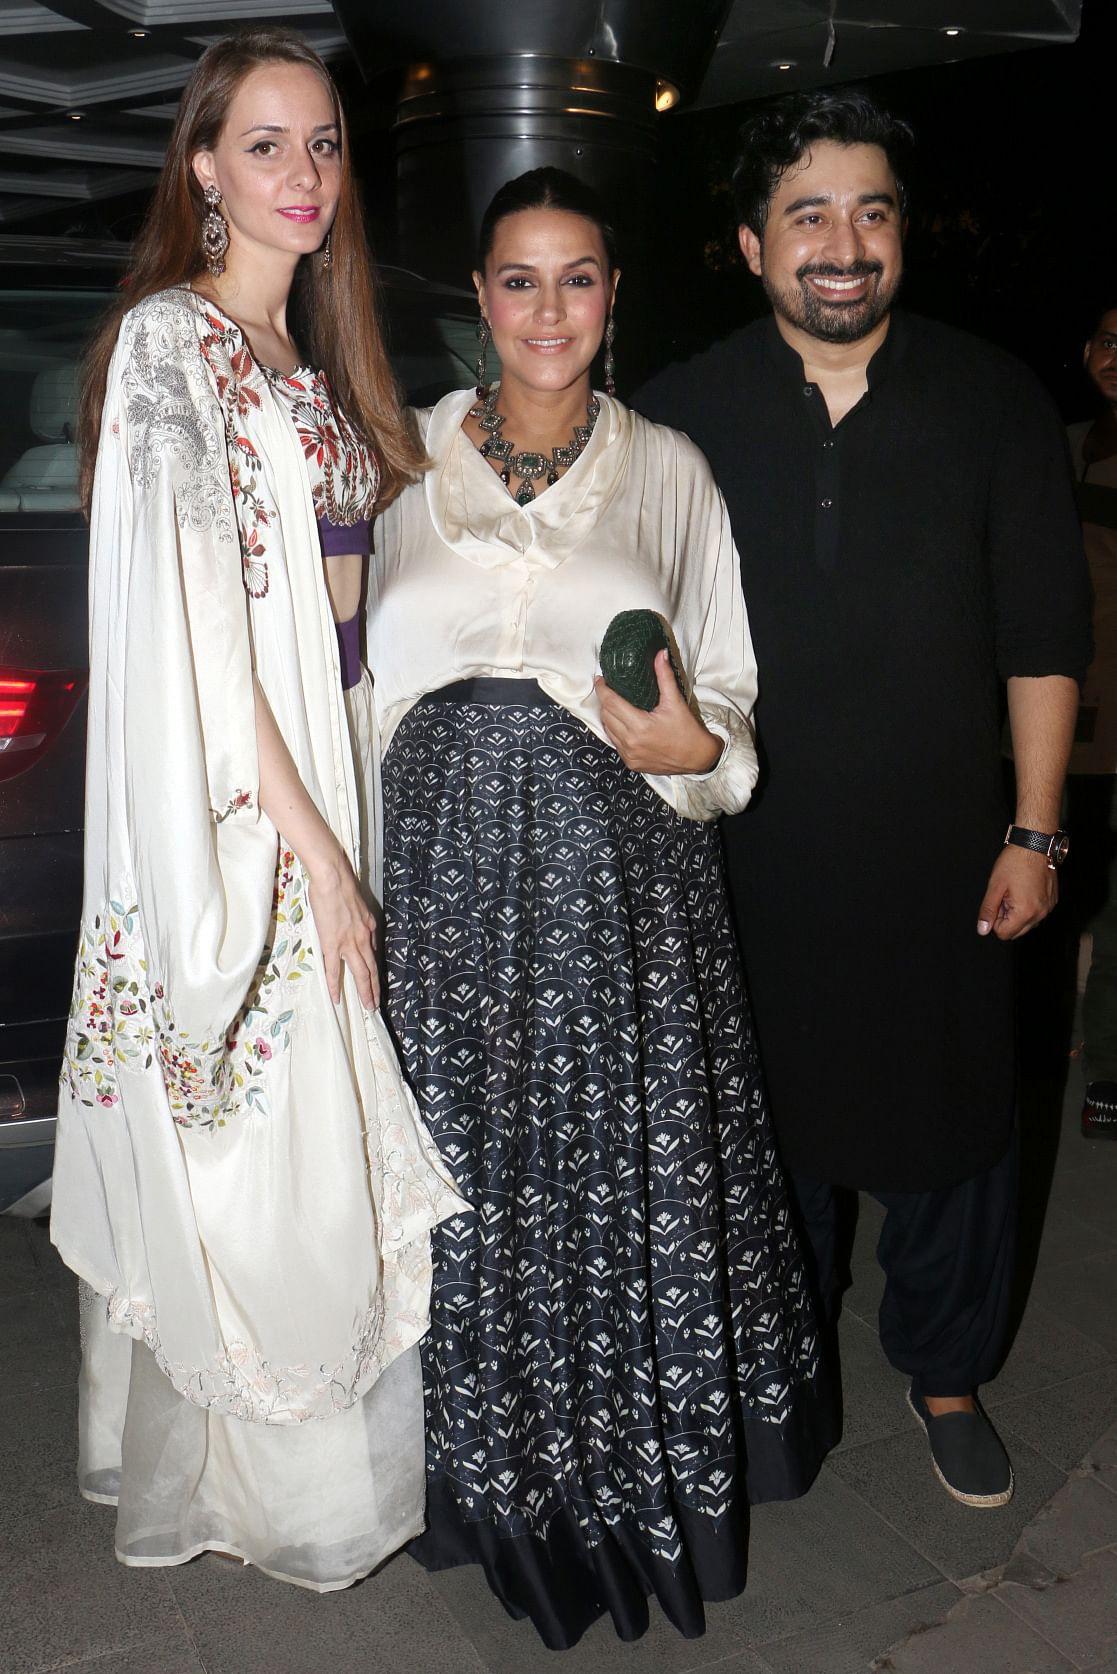 The <i>Roadies </i>gang was also there - Neha Dhupia, Rannvijay Singha with wife Priyanka.